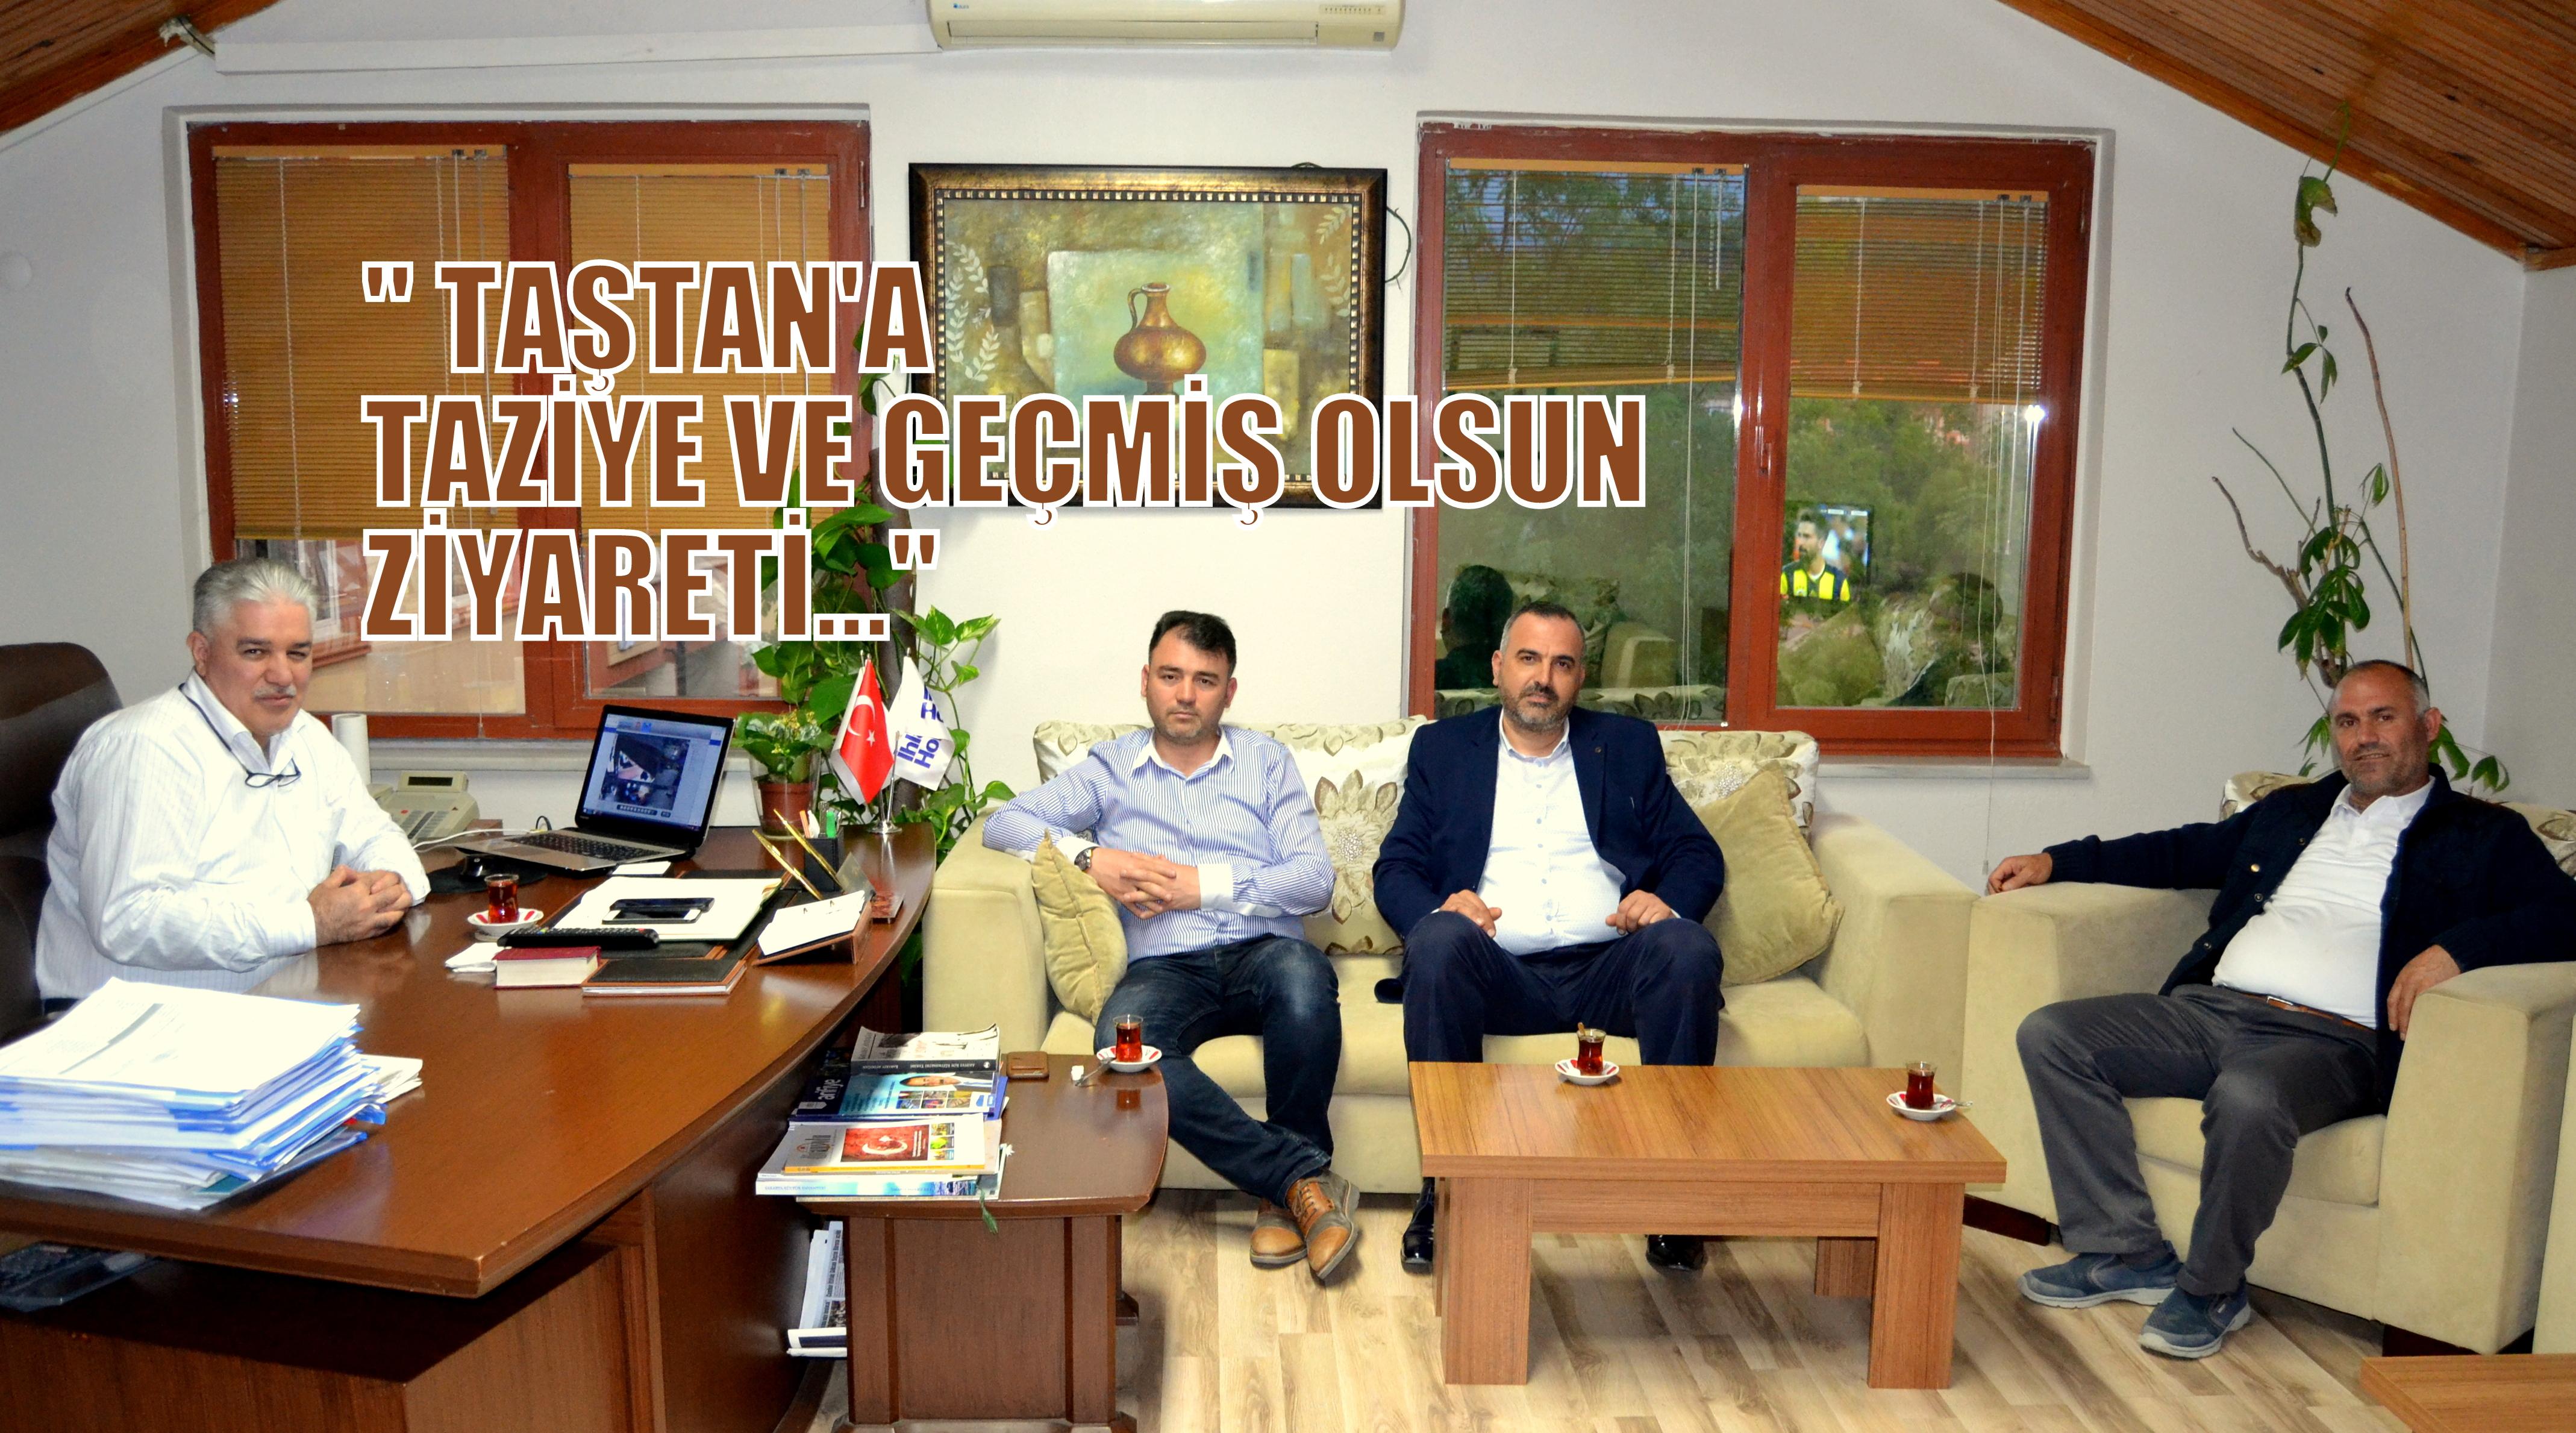 ARSİADER ACIYI PAYLAŞTI!..